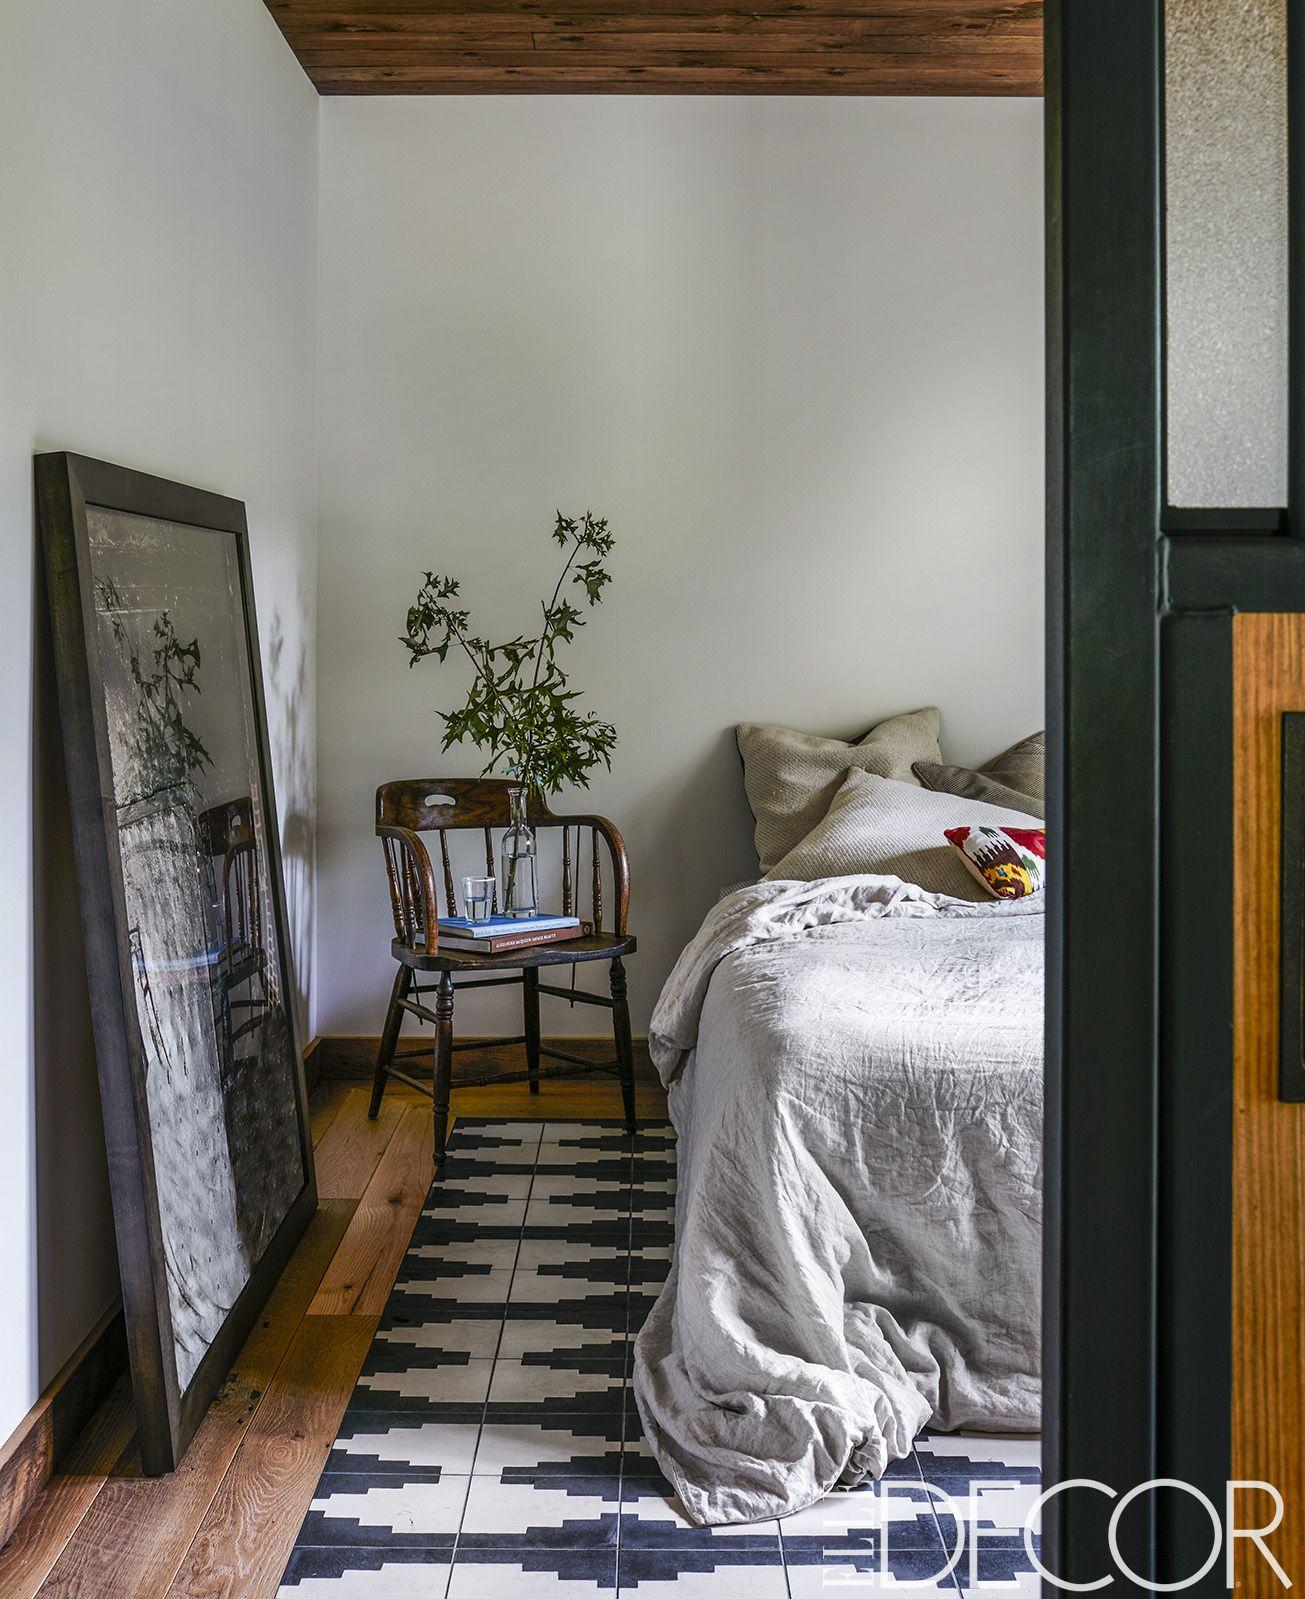 25 Minimalist Bedroom Decor Ideas - Modern Designs for ... on Bedroom Design Minimalist  id=93003